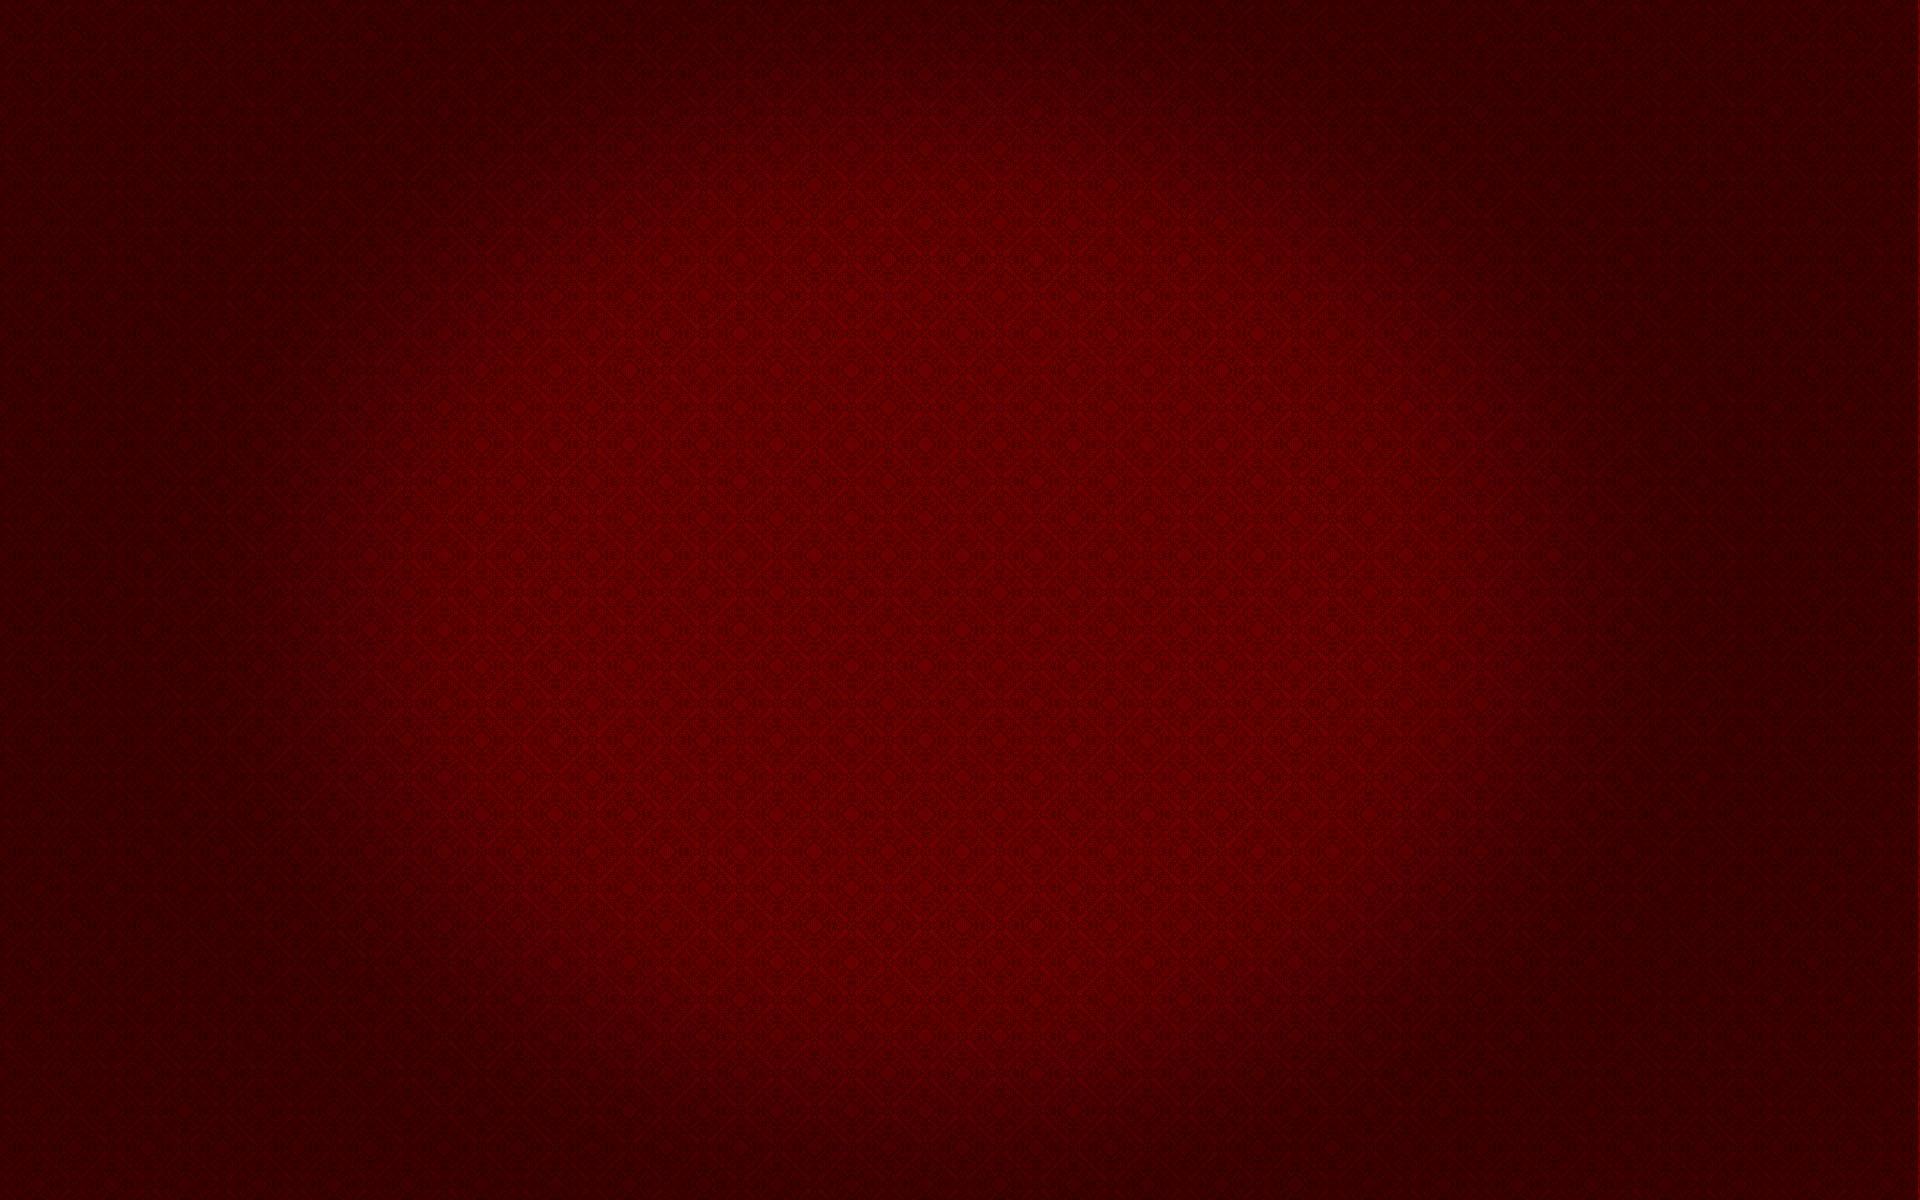 Burgundy wallpaper 74063 1920x1200